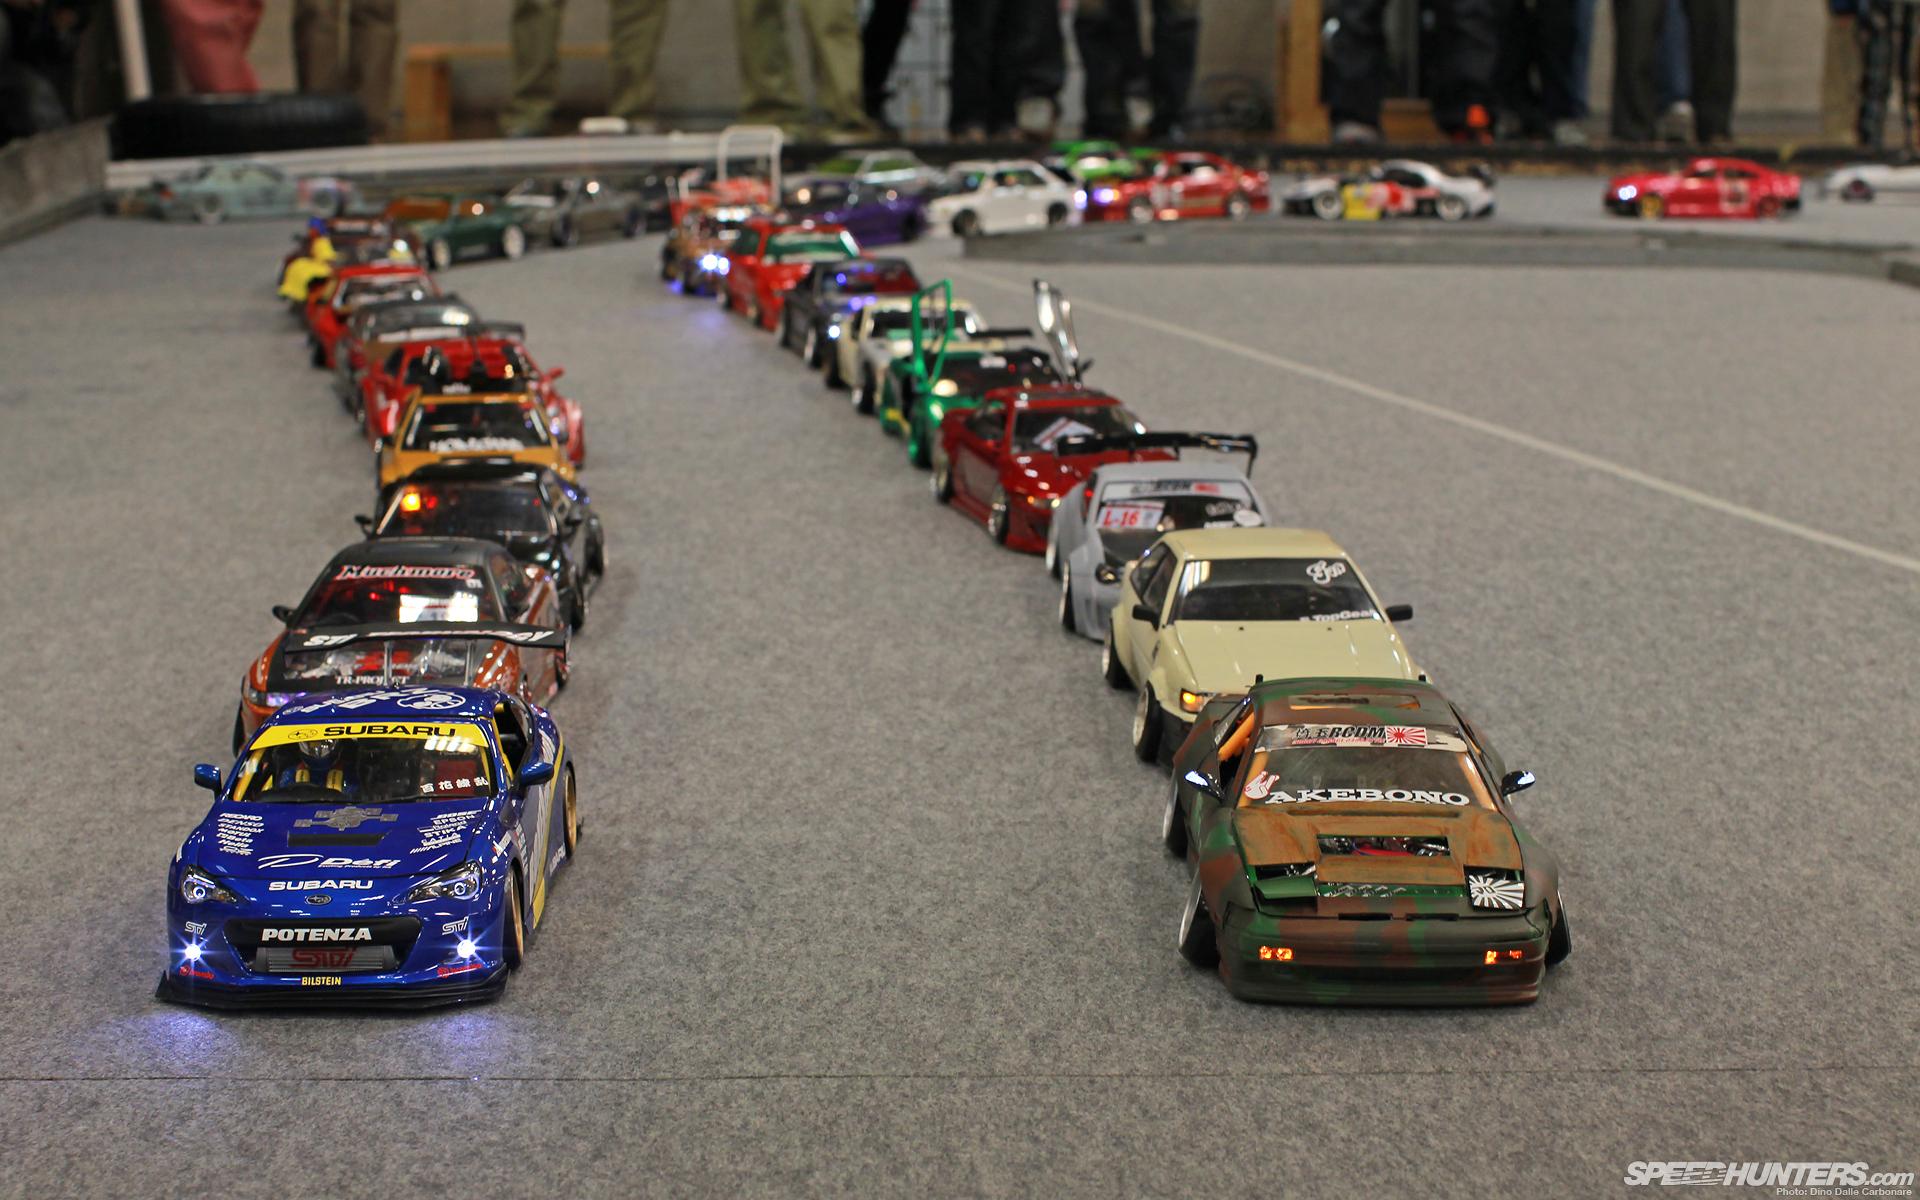 Line Rc Cars Toys Subaru Brz Nissan 240sx Tuning Toys